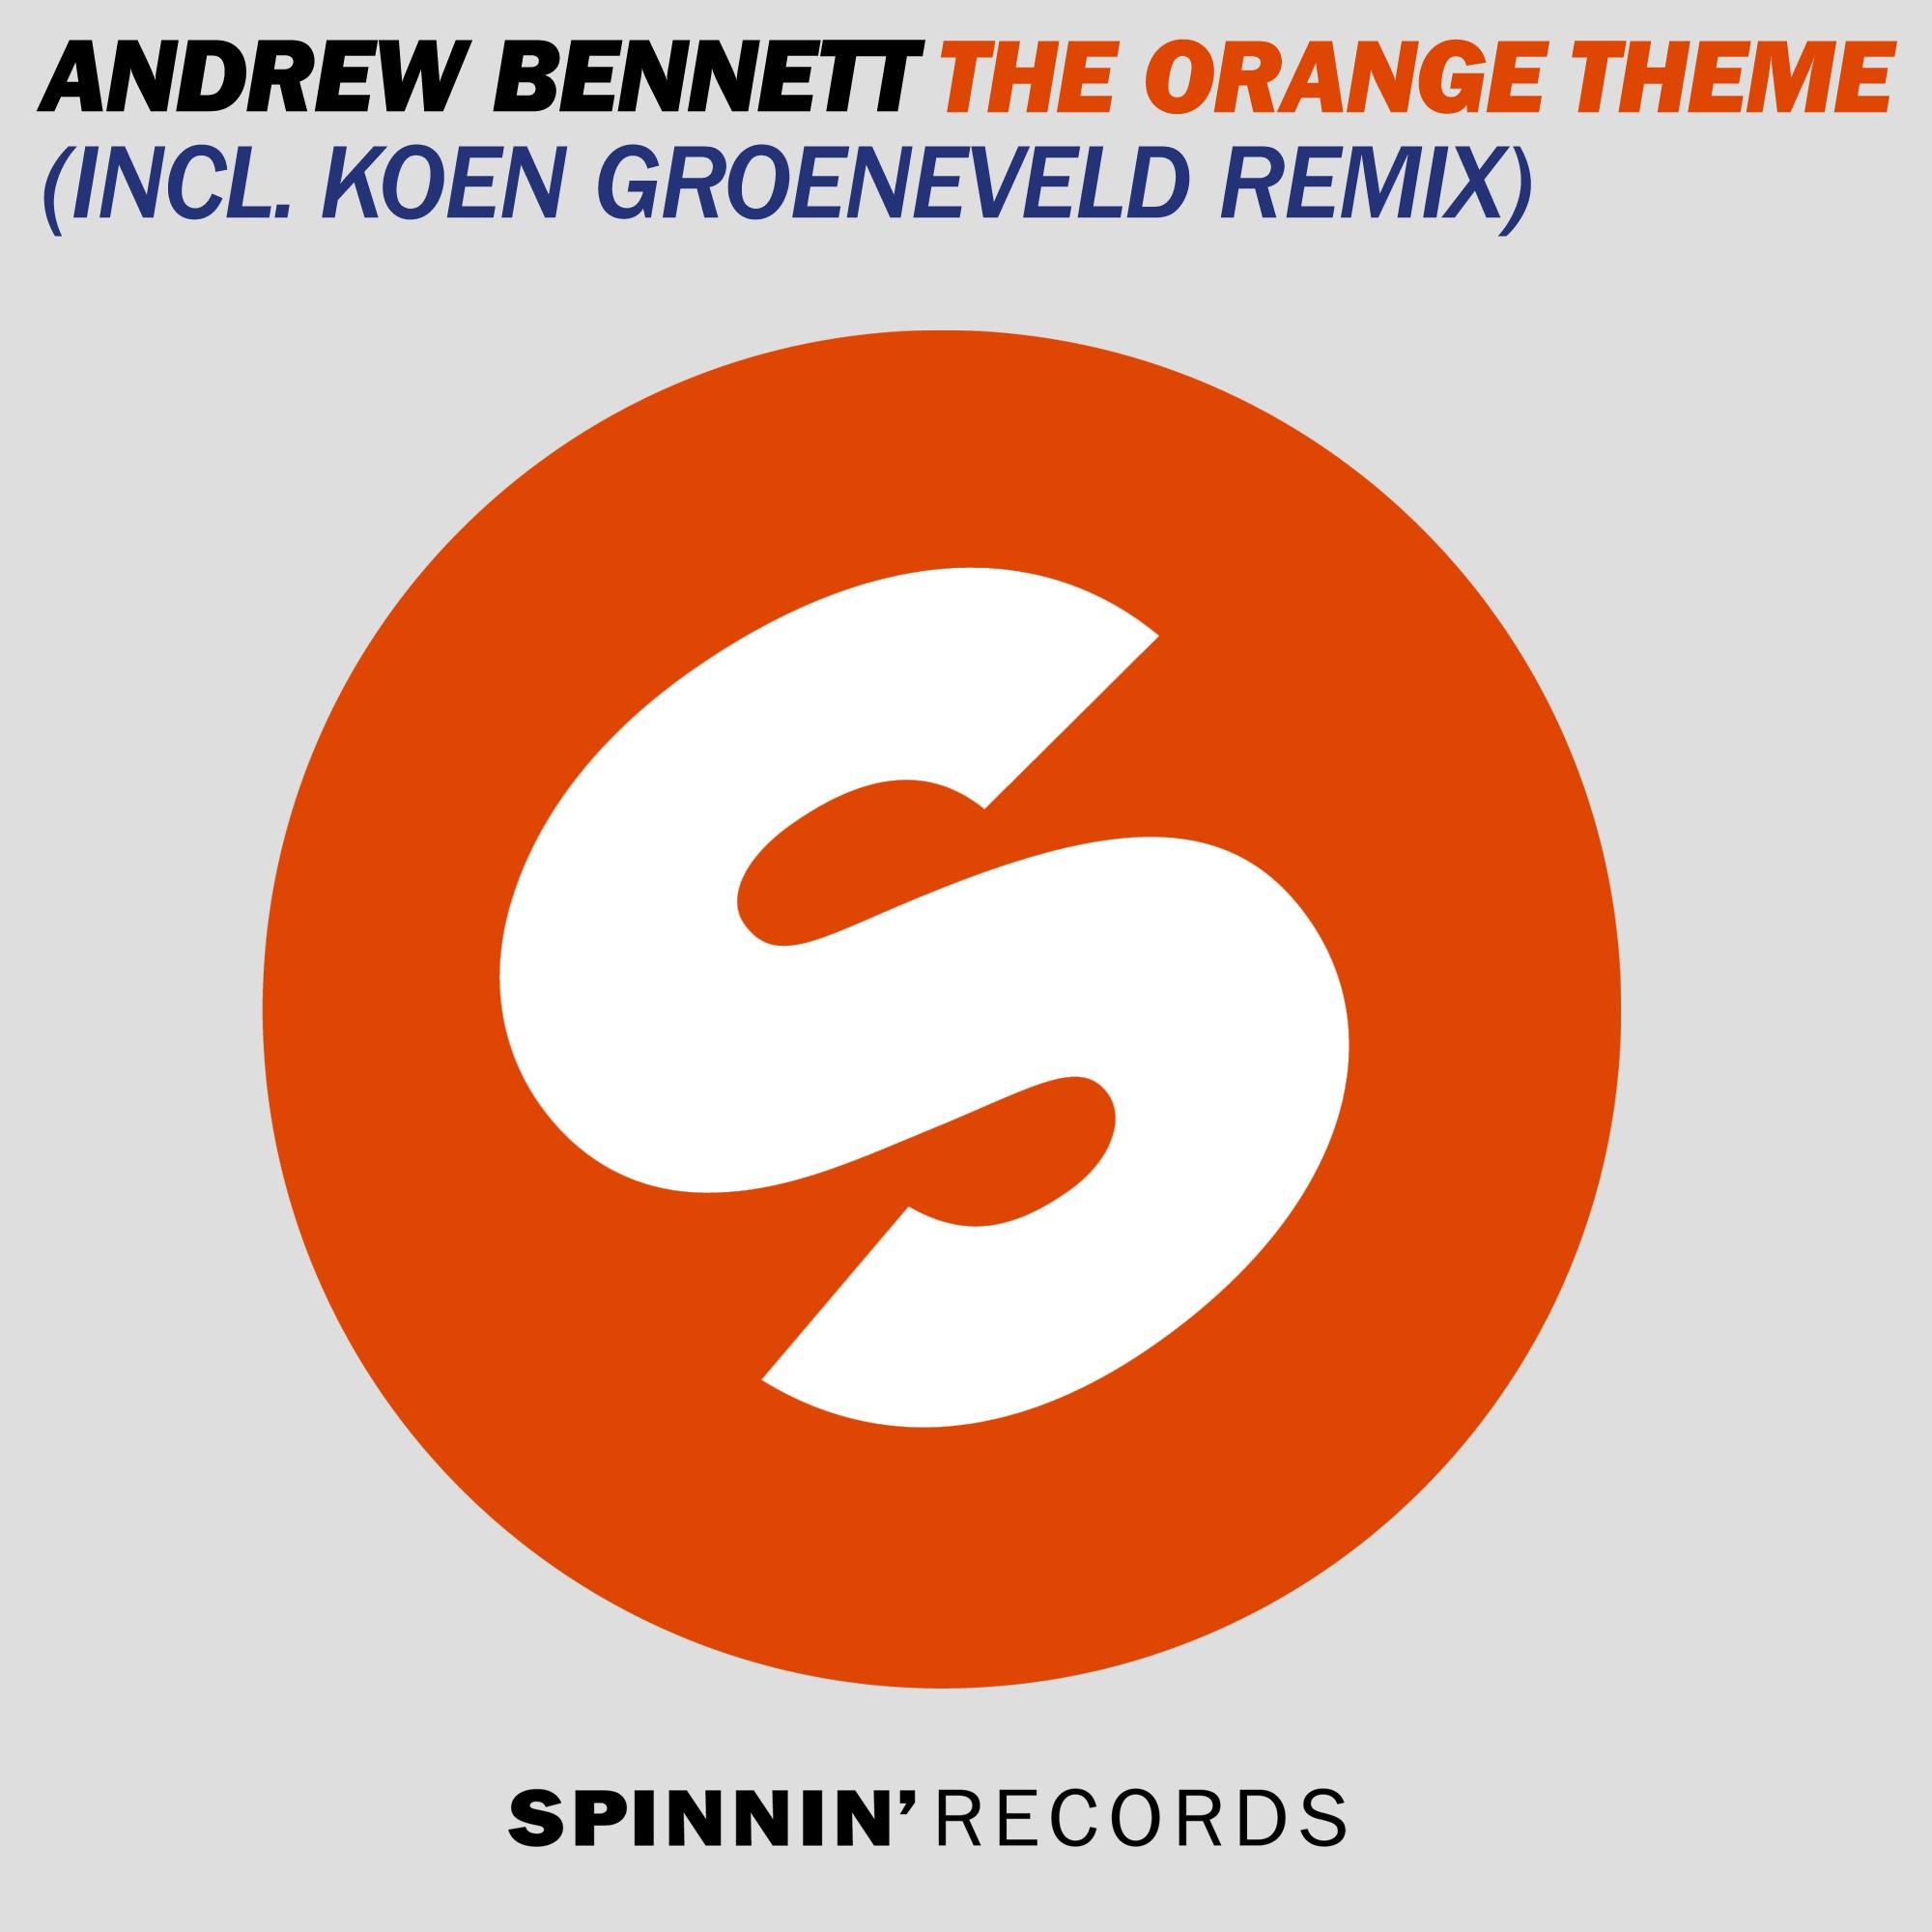 The Orange Theme (Original Mix)